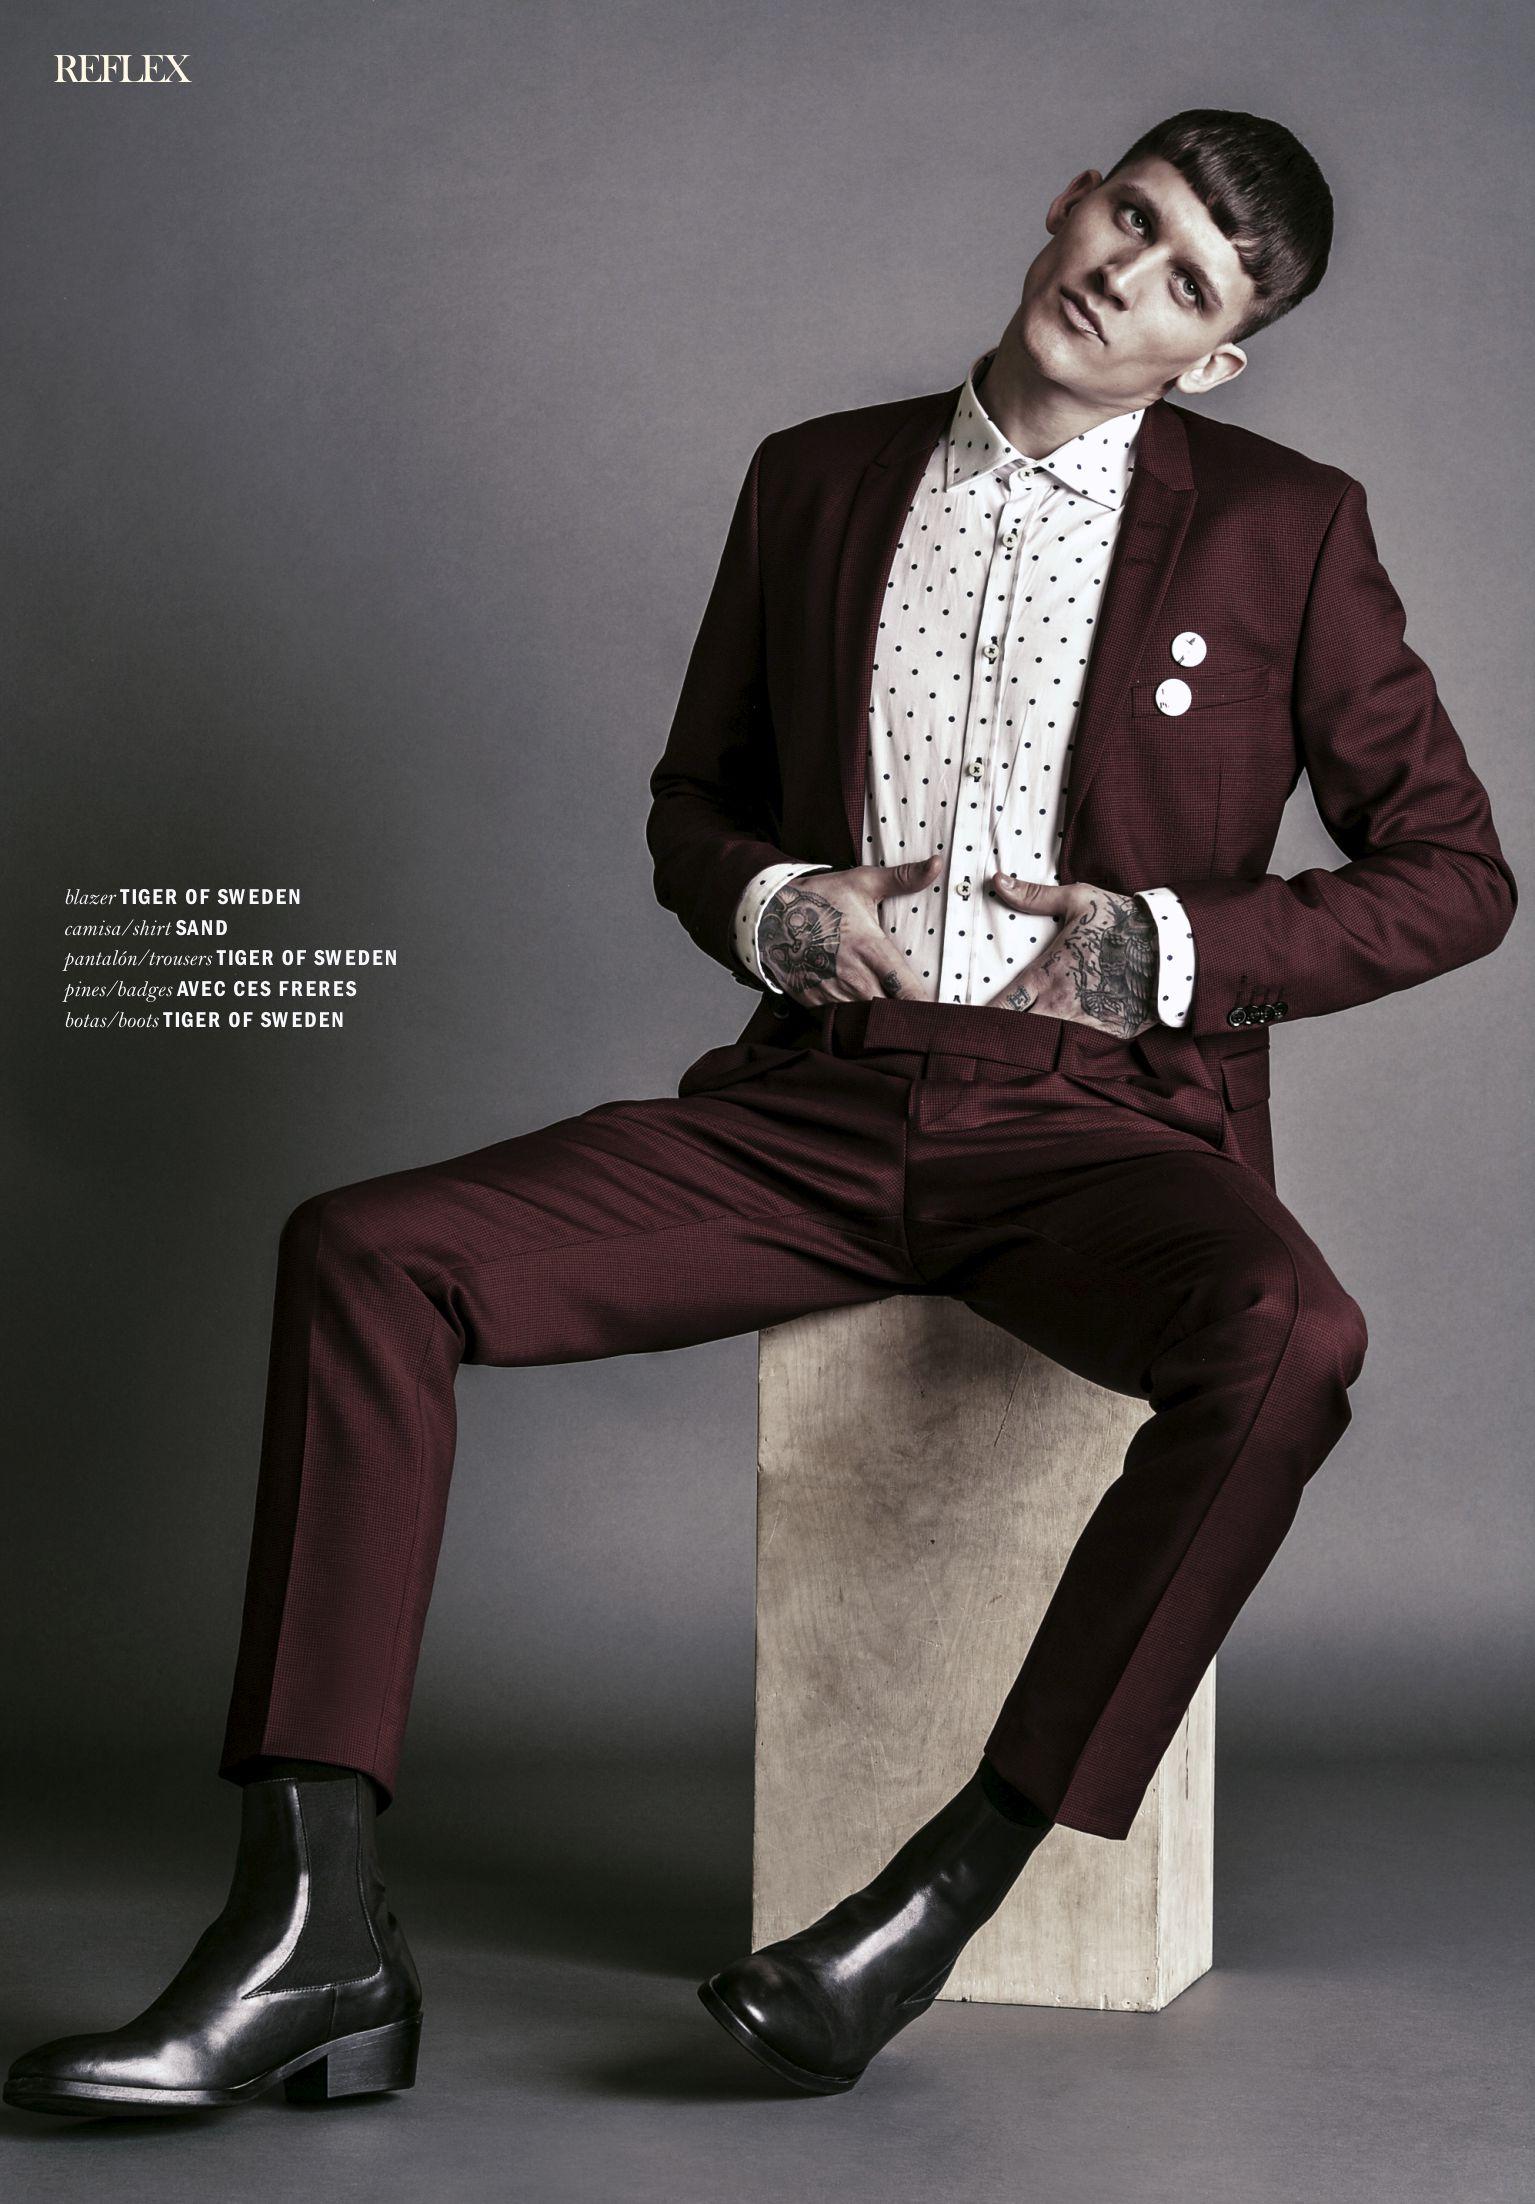 Leebo Freeman For Reflex Homme April 2015 Fashionably Male